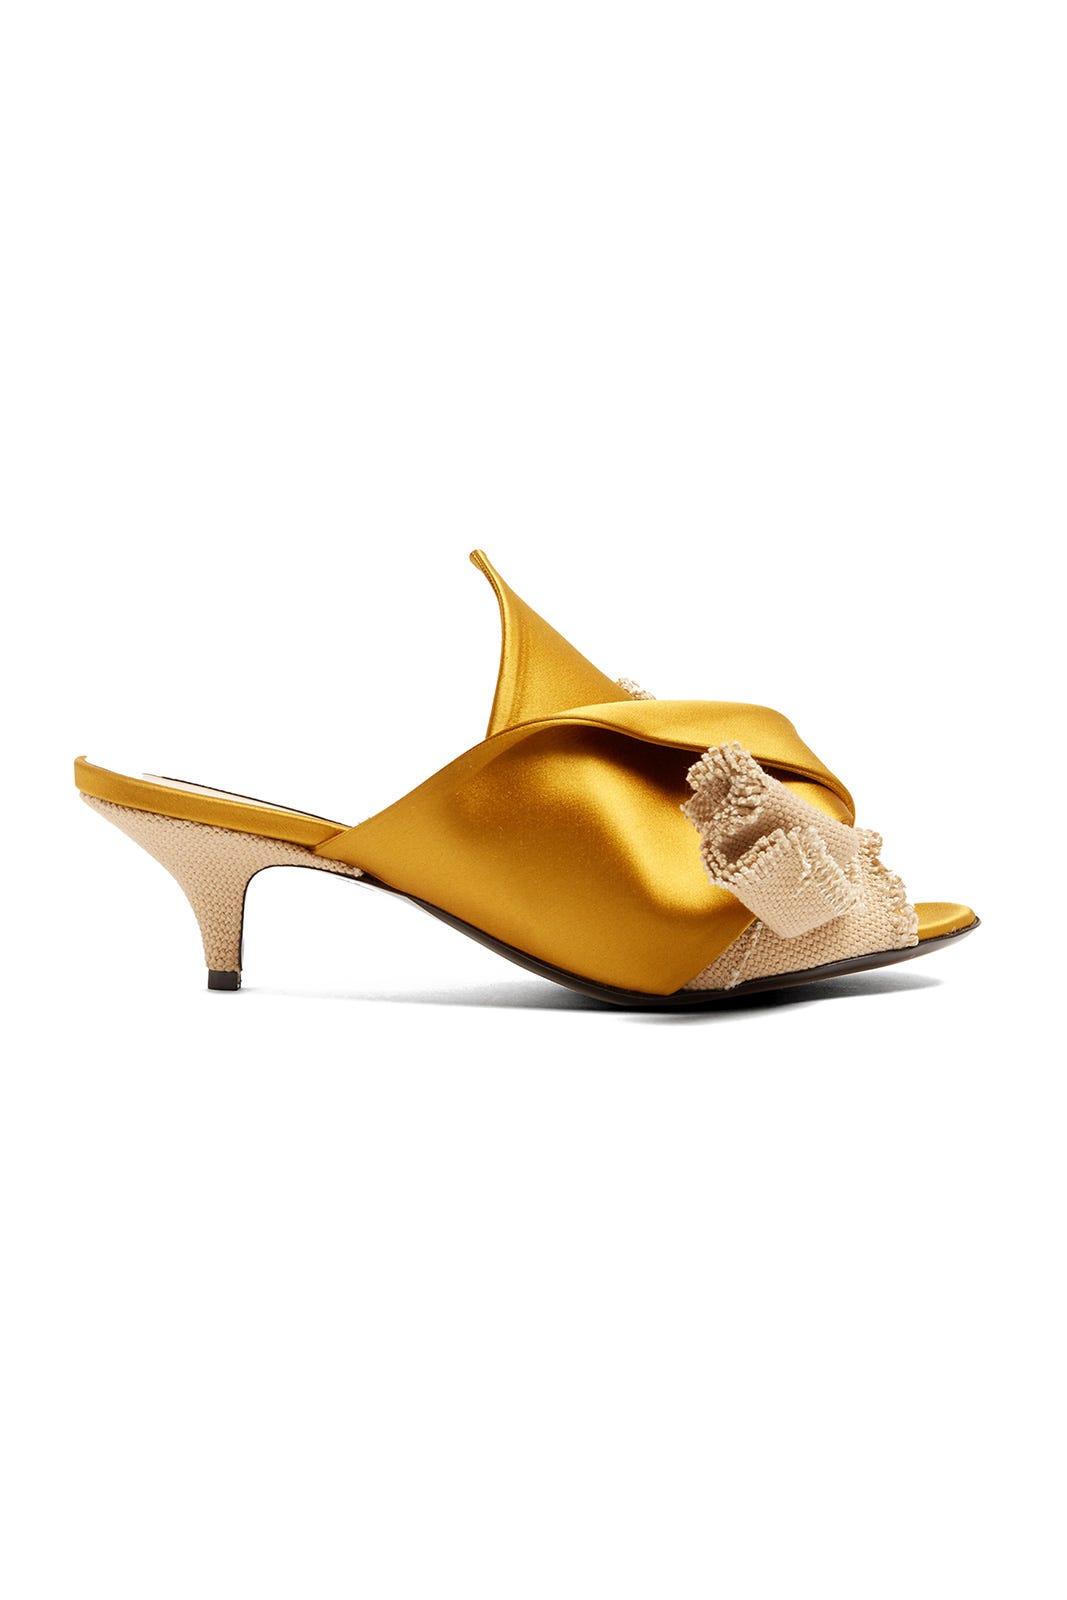 32e710bd8a8 2017 Shoe Trends - Kitten Heels